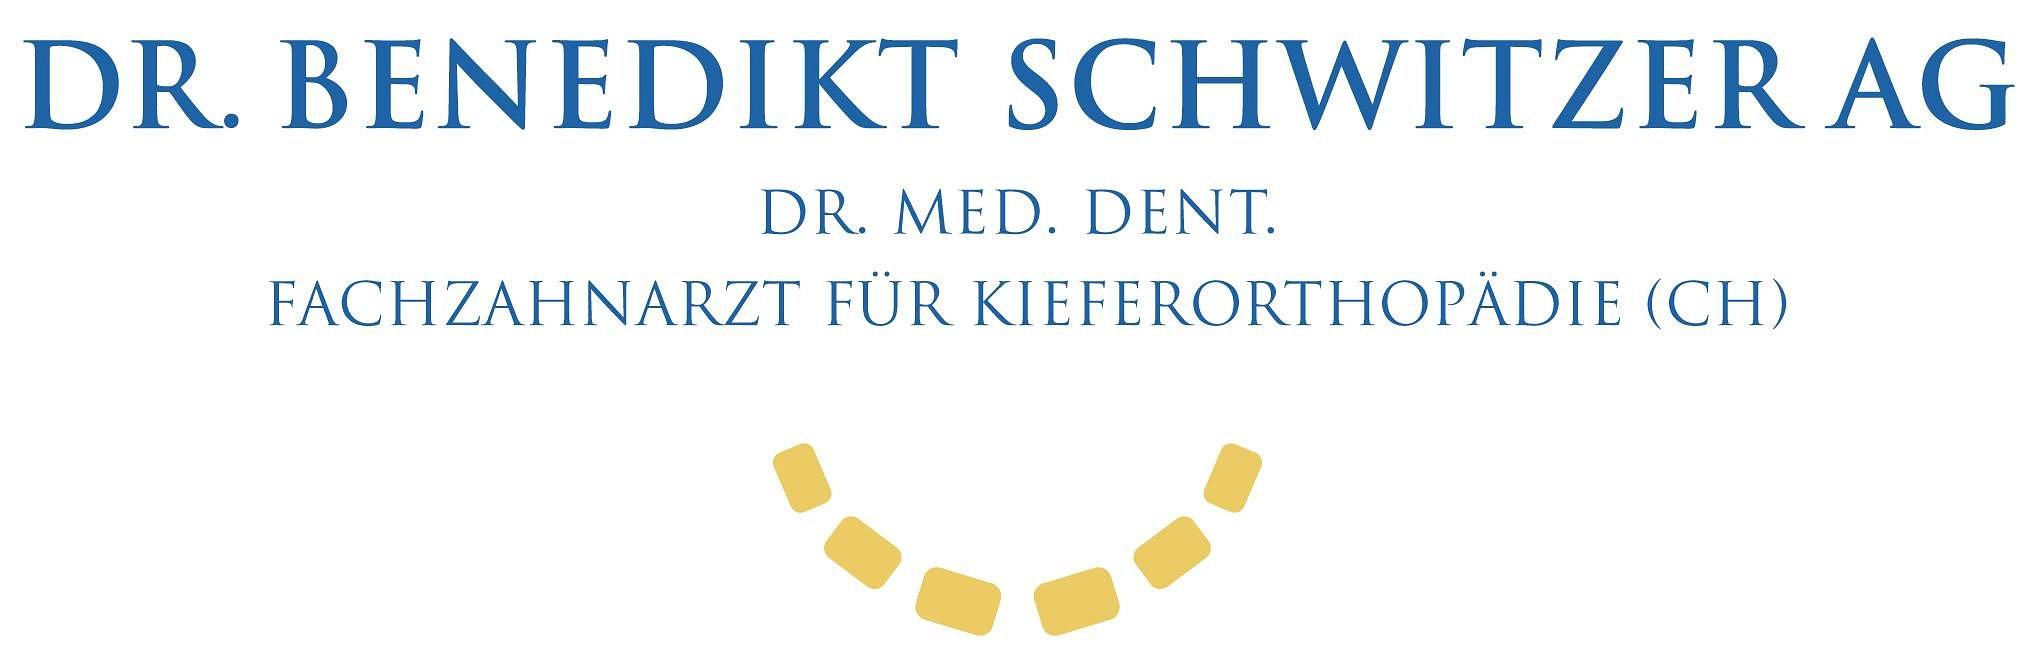 Dr. med. dent. Benedikt Schwitzer